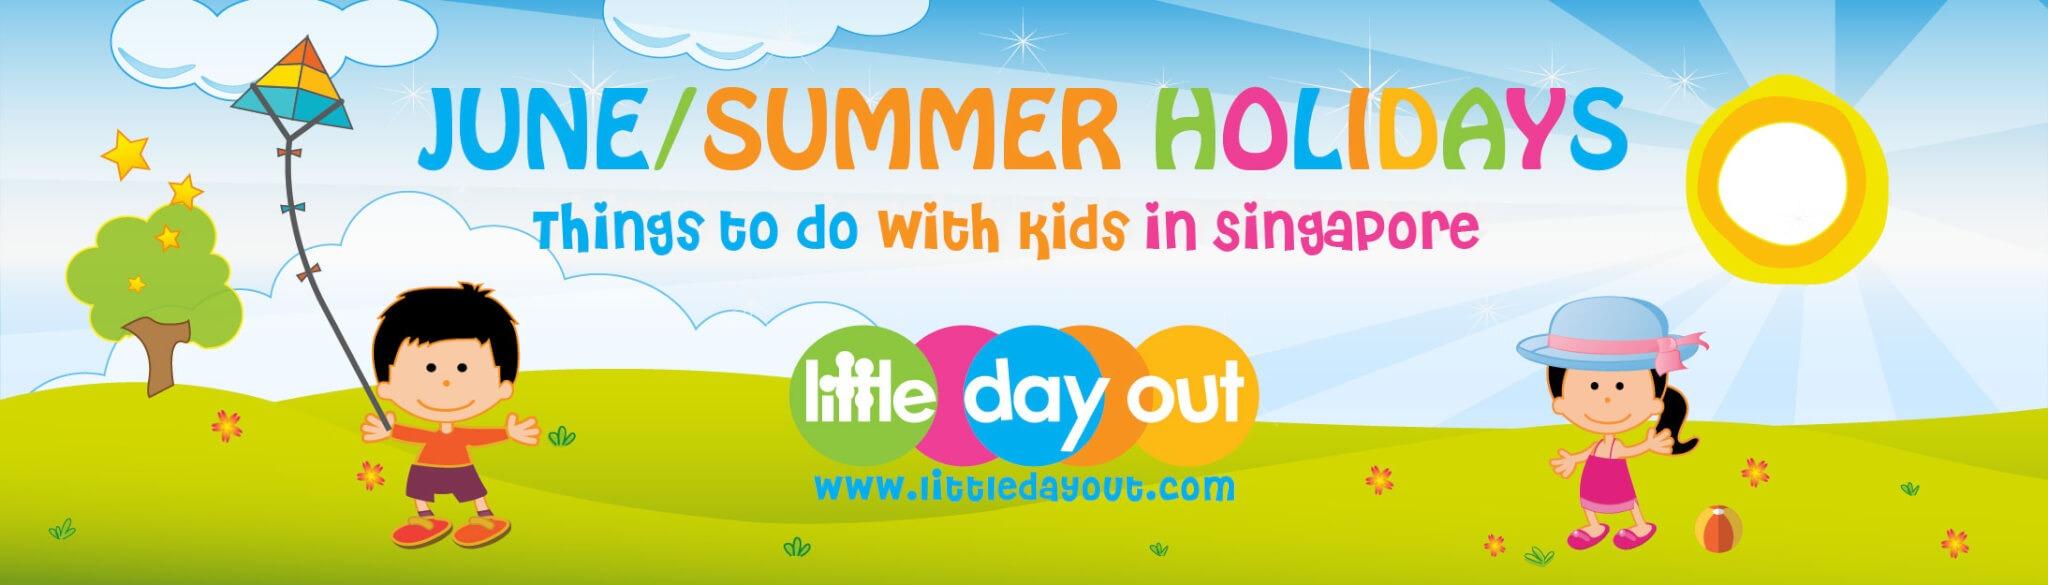 June school holidays for kids